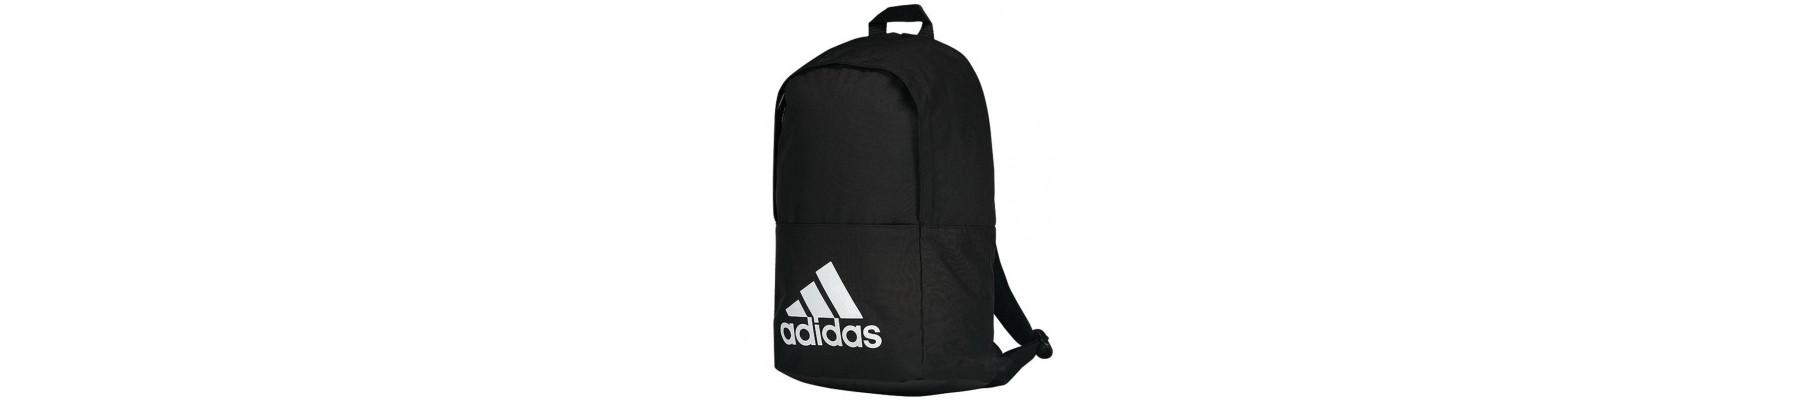 Adidas Classic BP Black